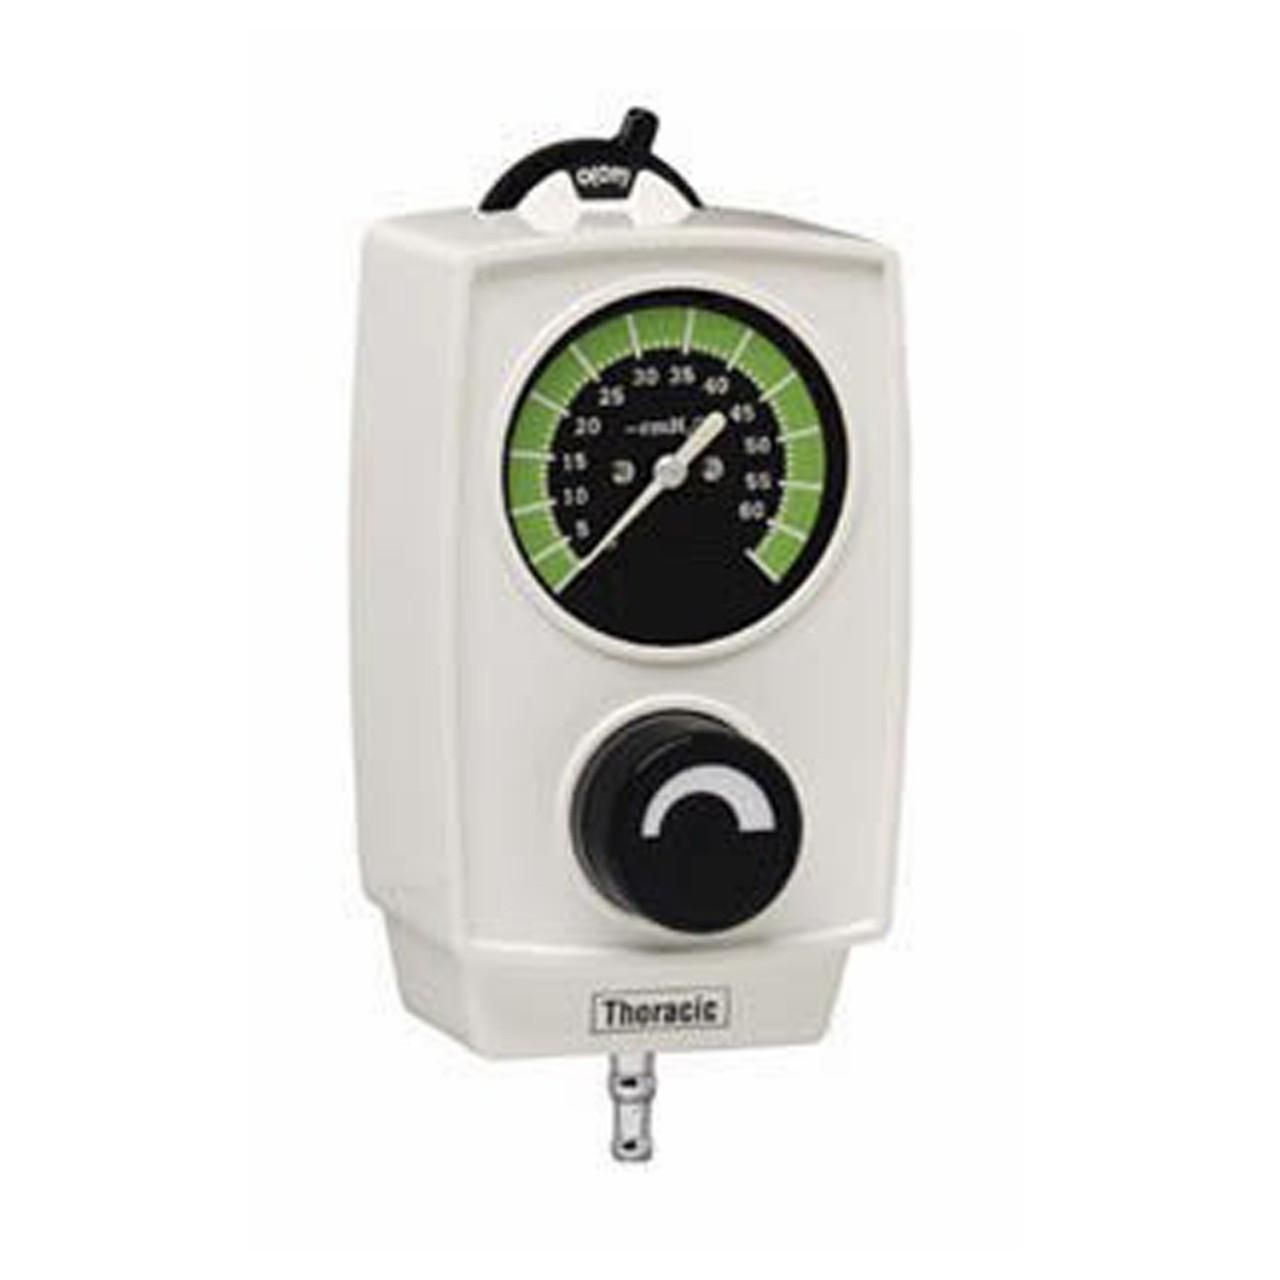 Ohio 1275 Thoracic Vacuum Regulatoron Medical Oxygen Regulator